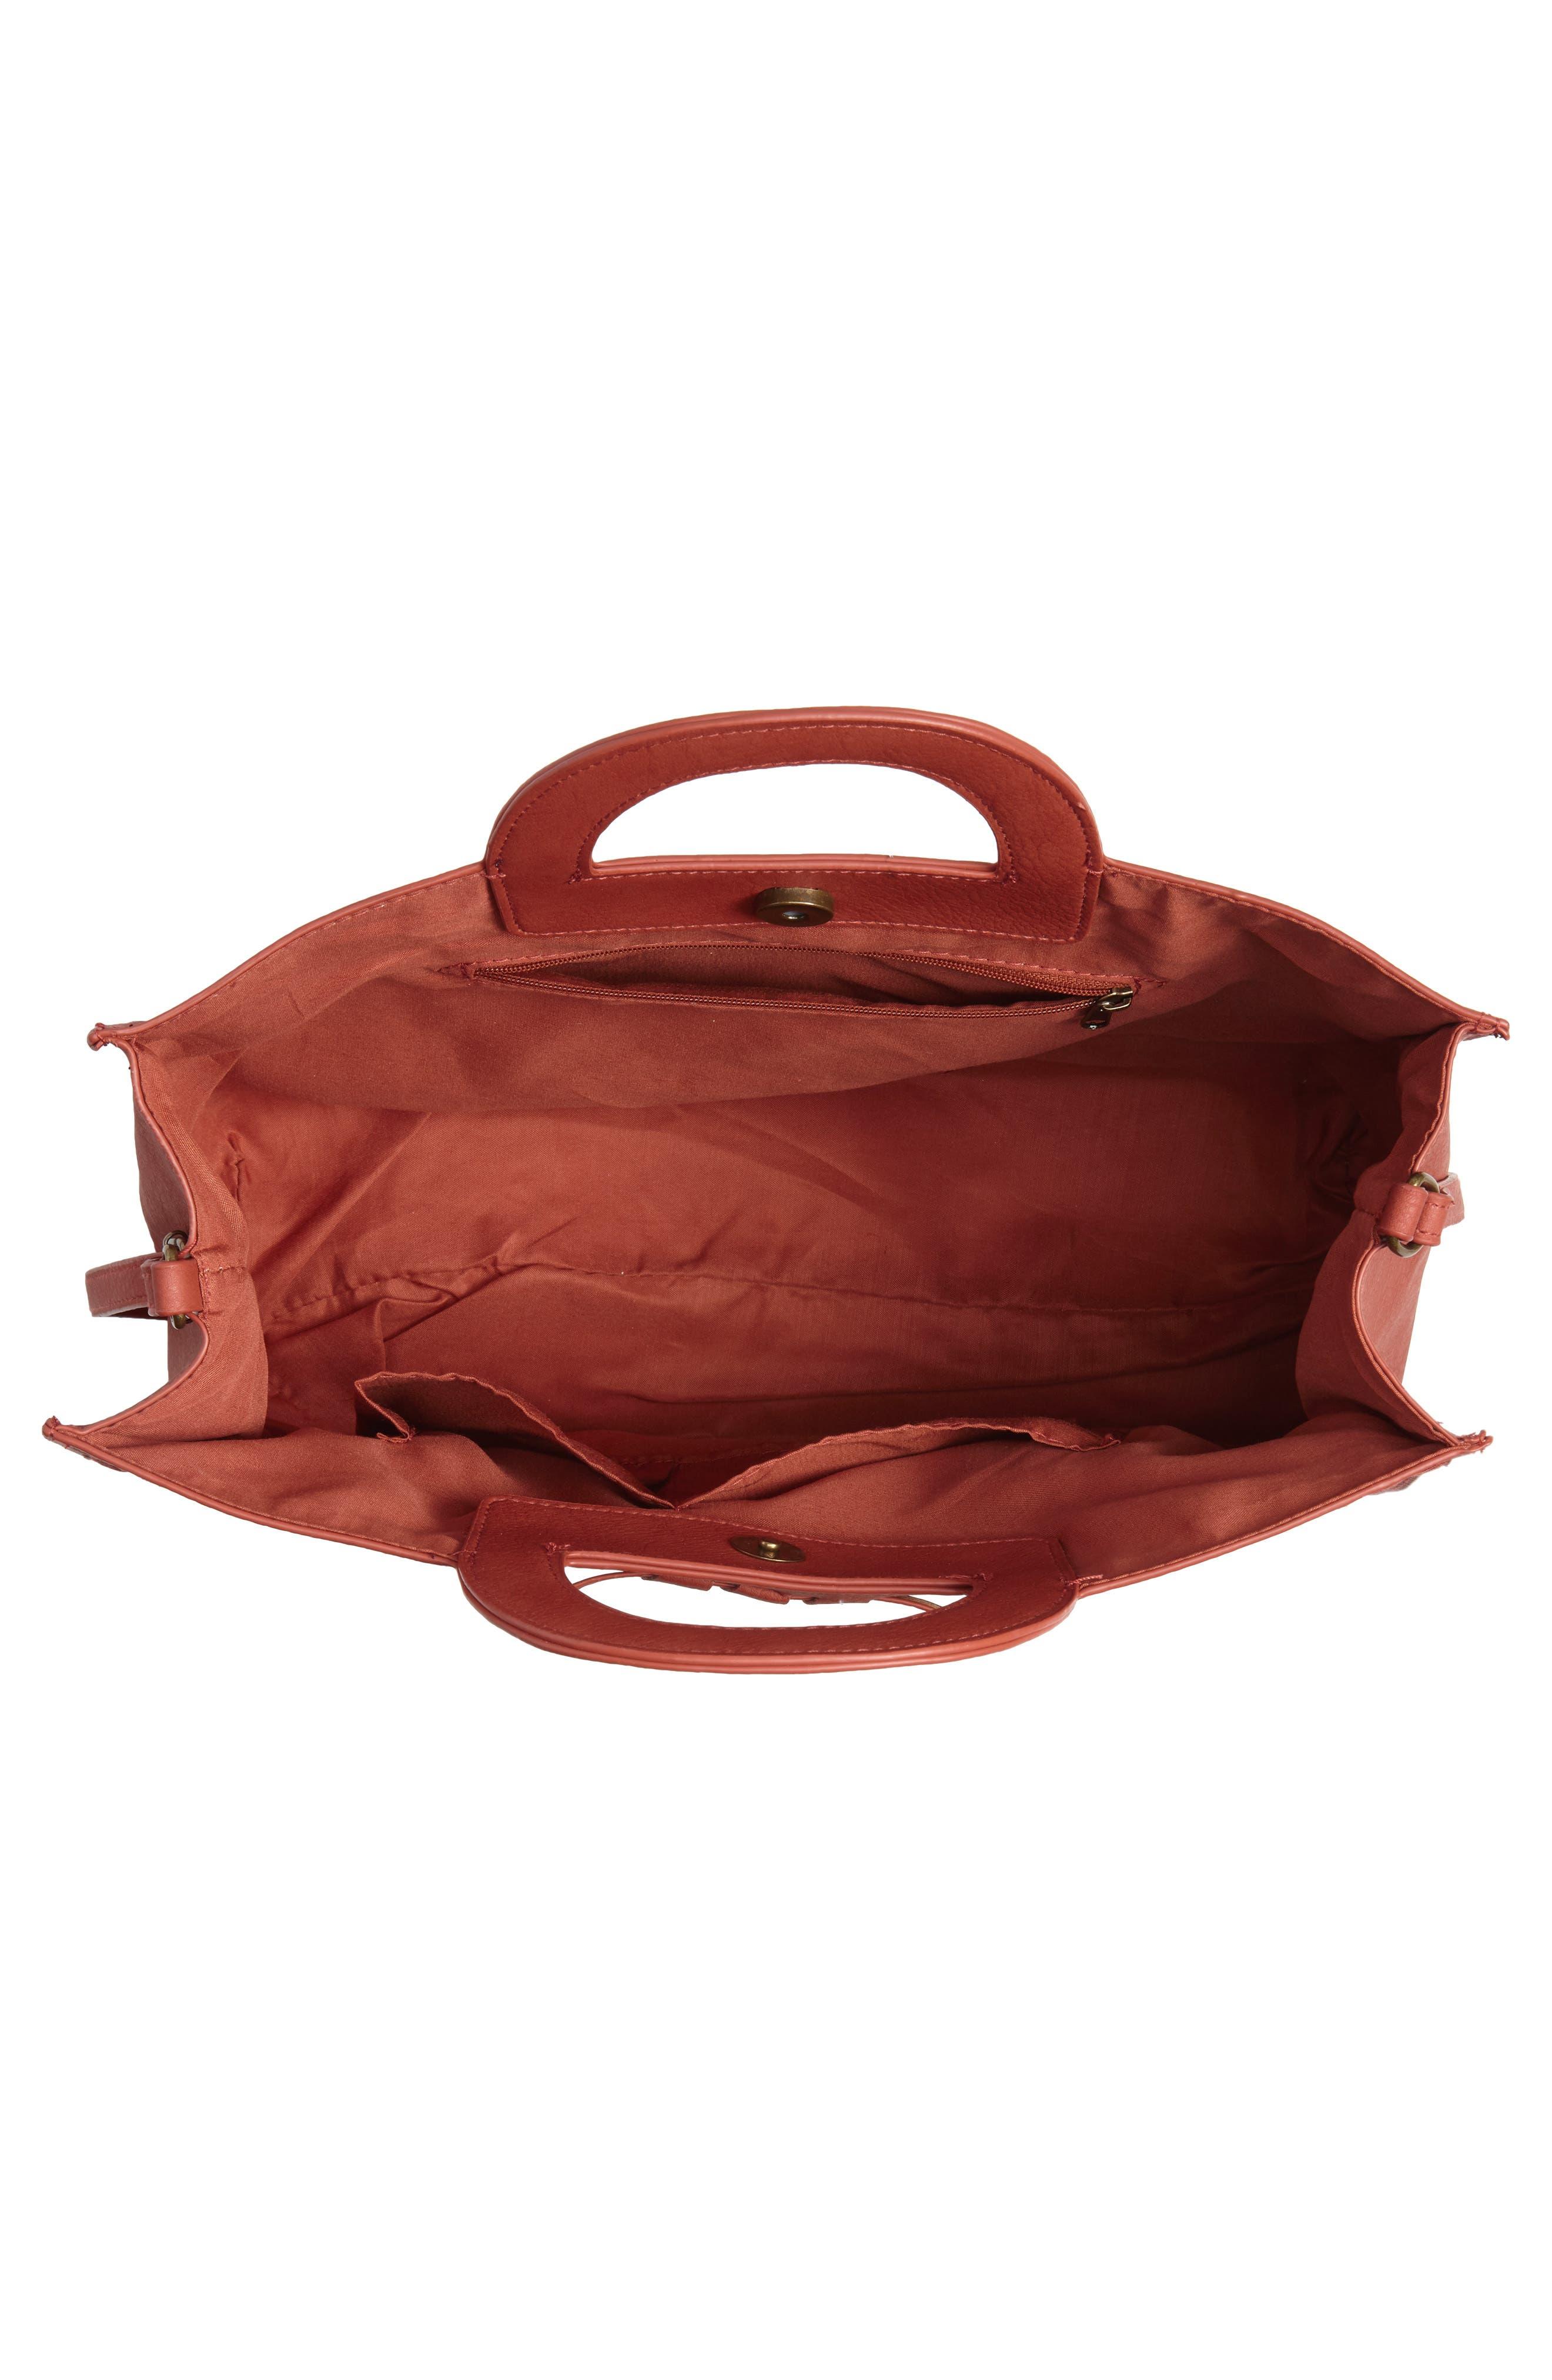 T-SHIRT & JEANS, Faux Leather Top Handle Tote Bag, Alternate thumbnail 5, color, 805